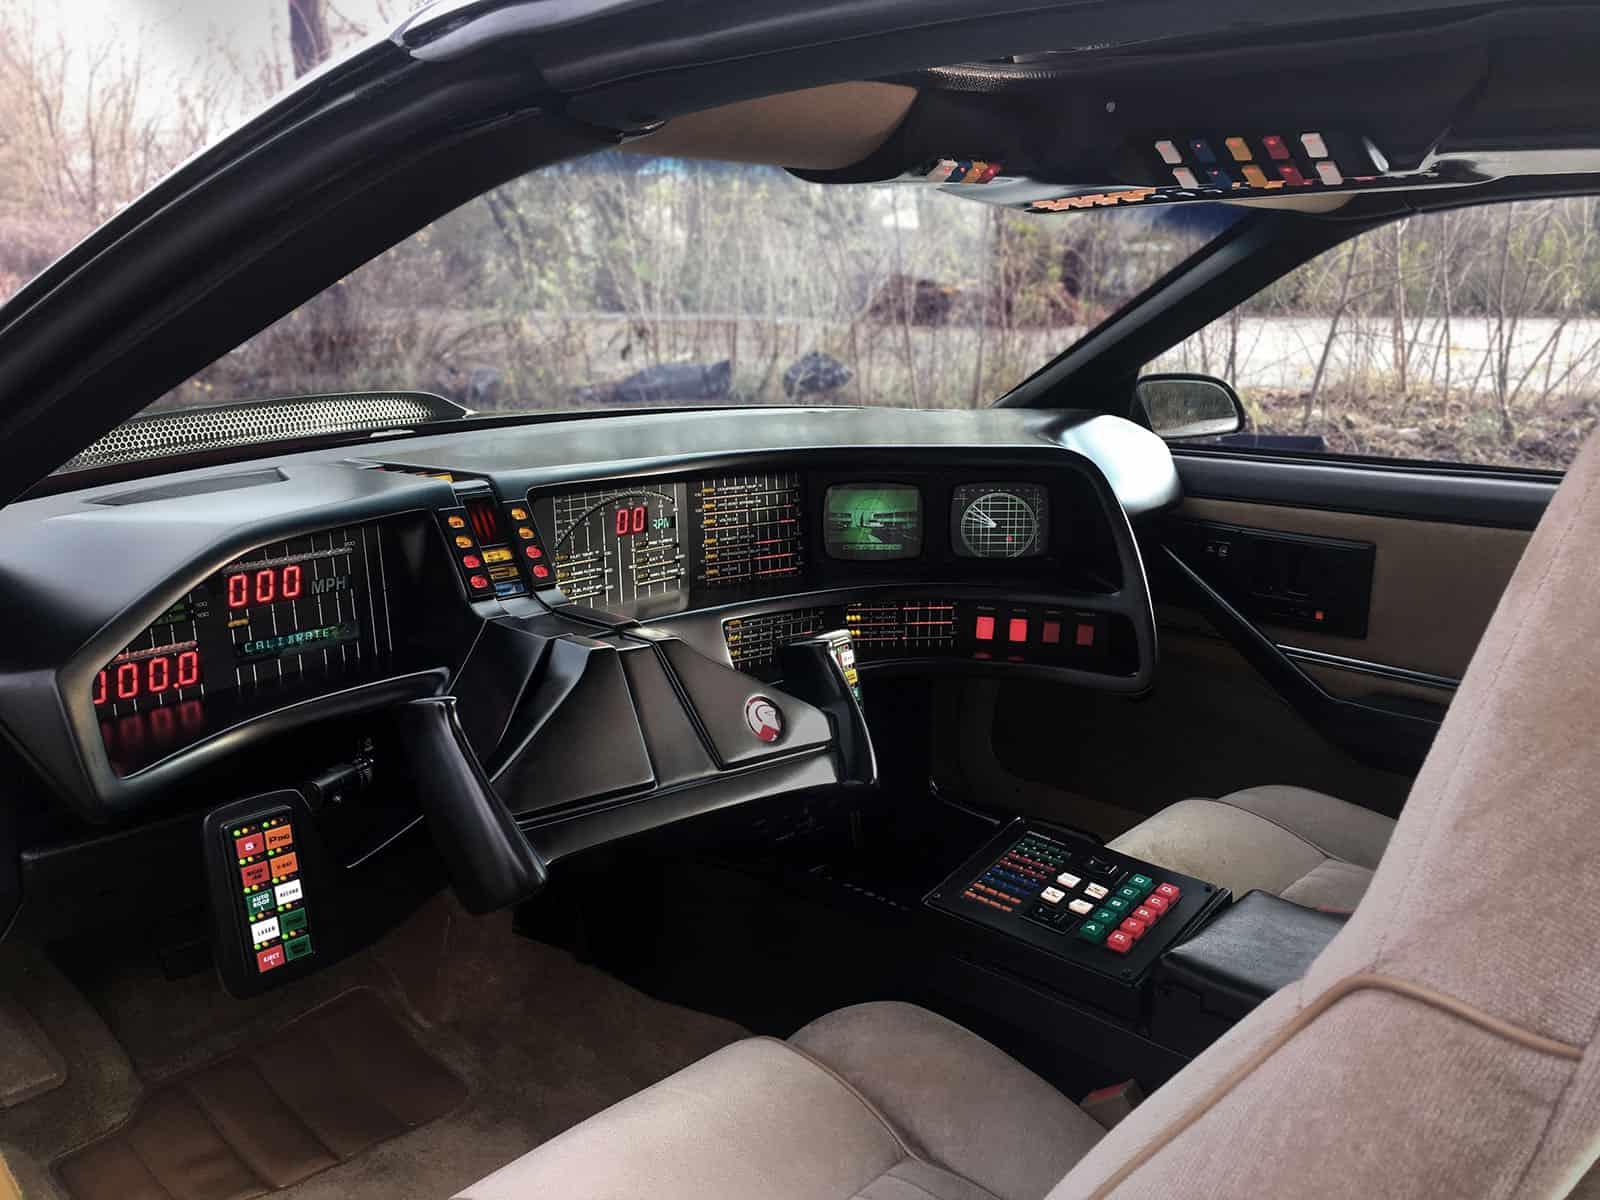 KITT Replika Dashboard Knight Rider of Germany